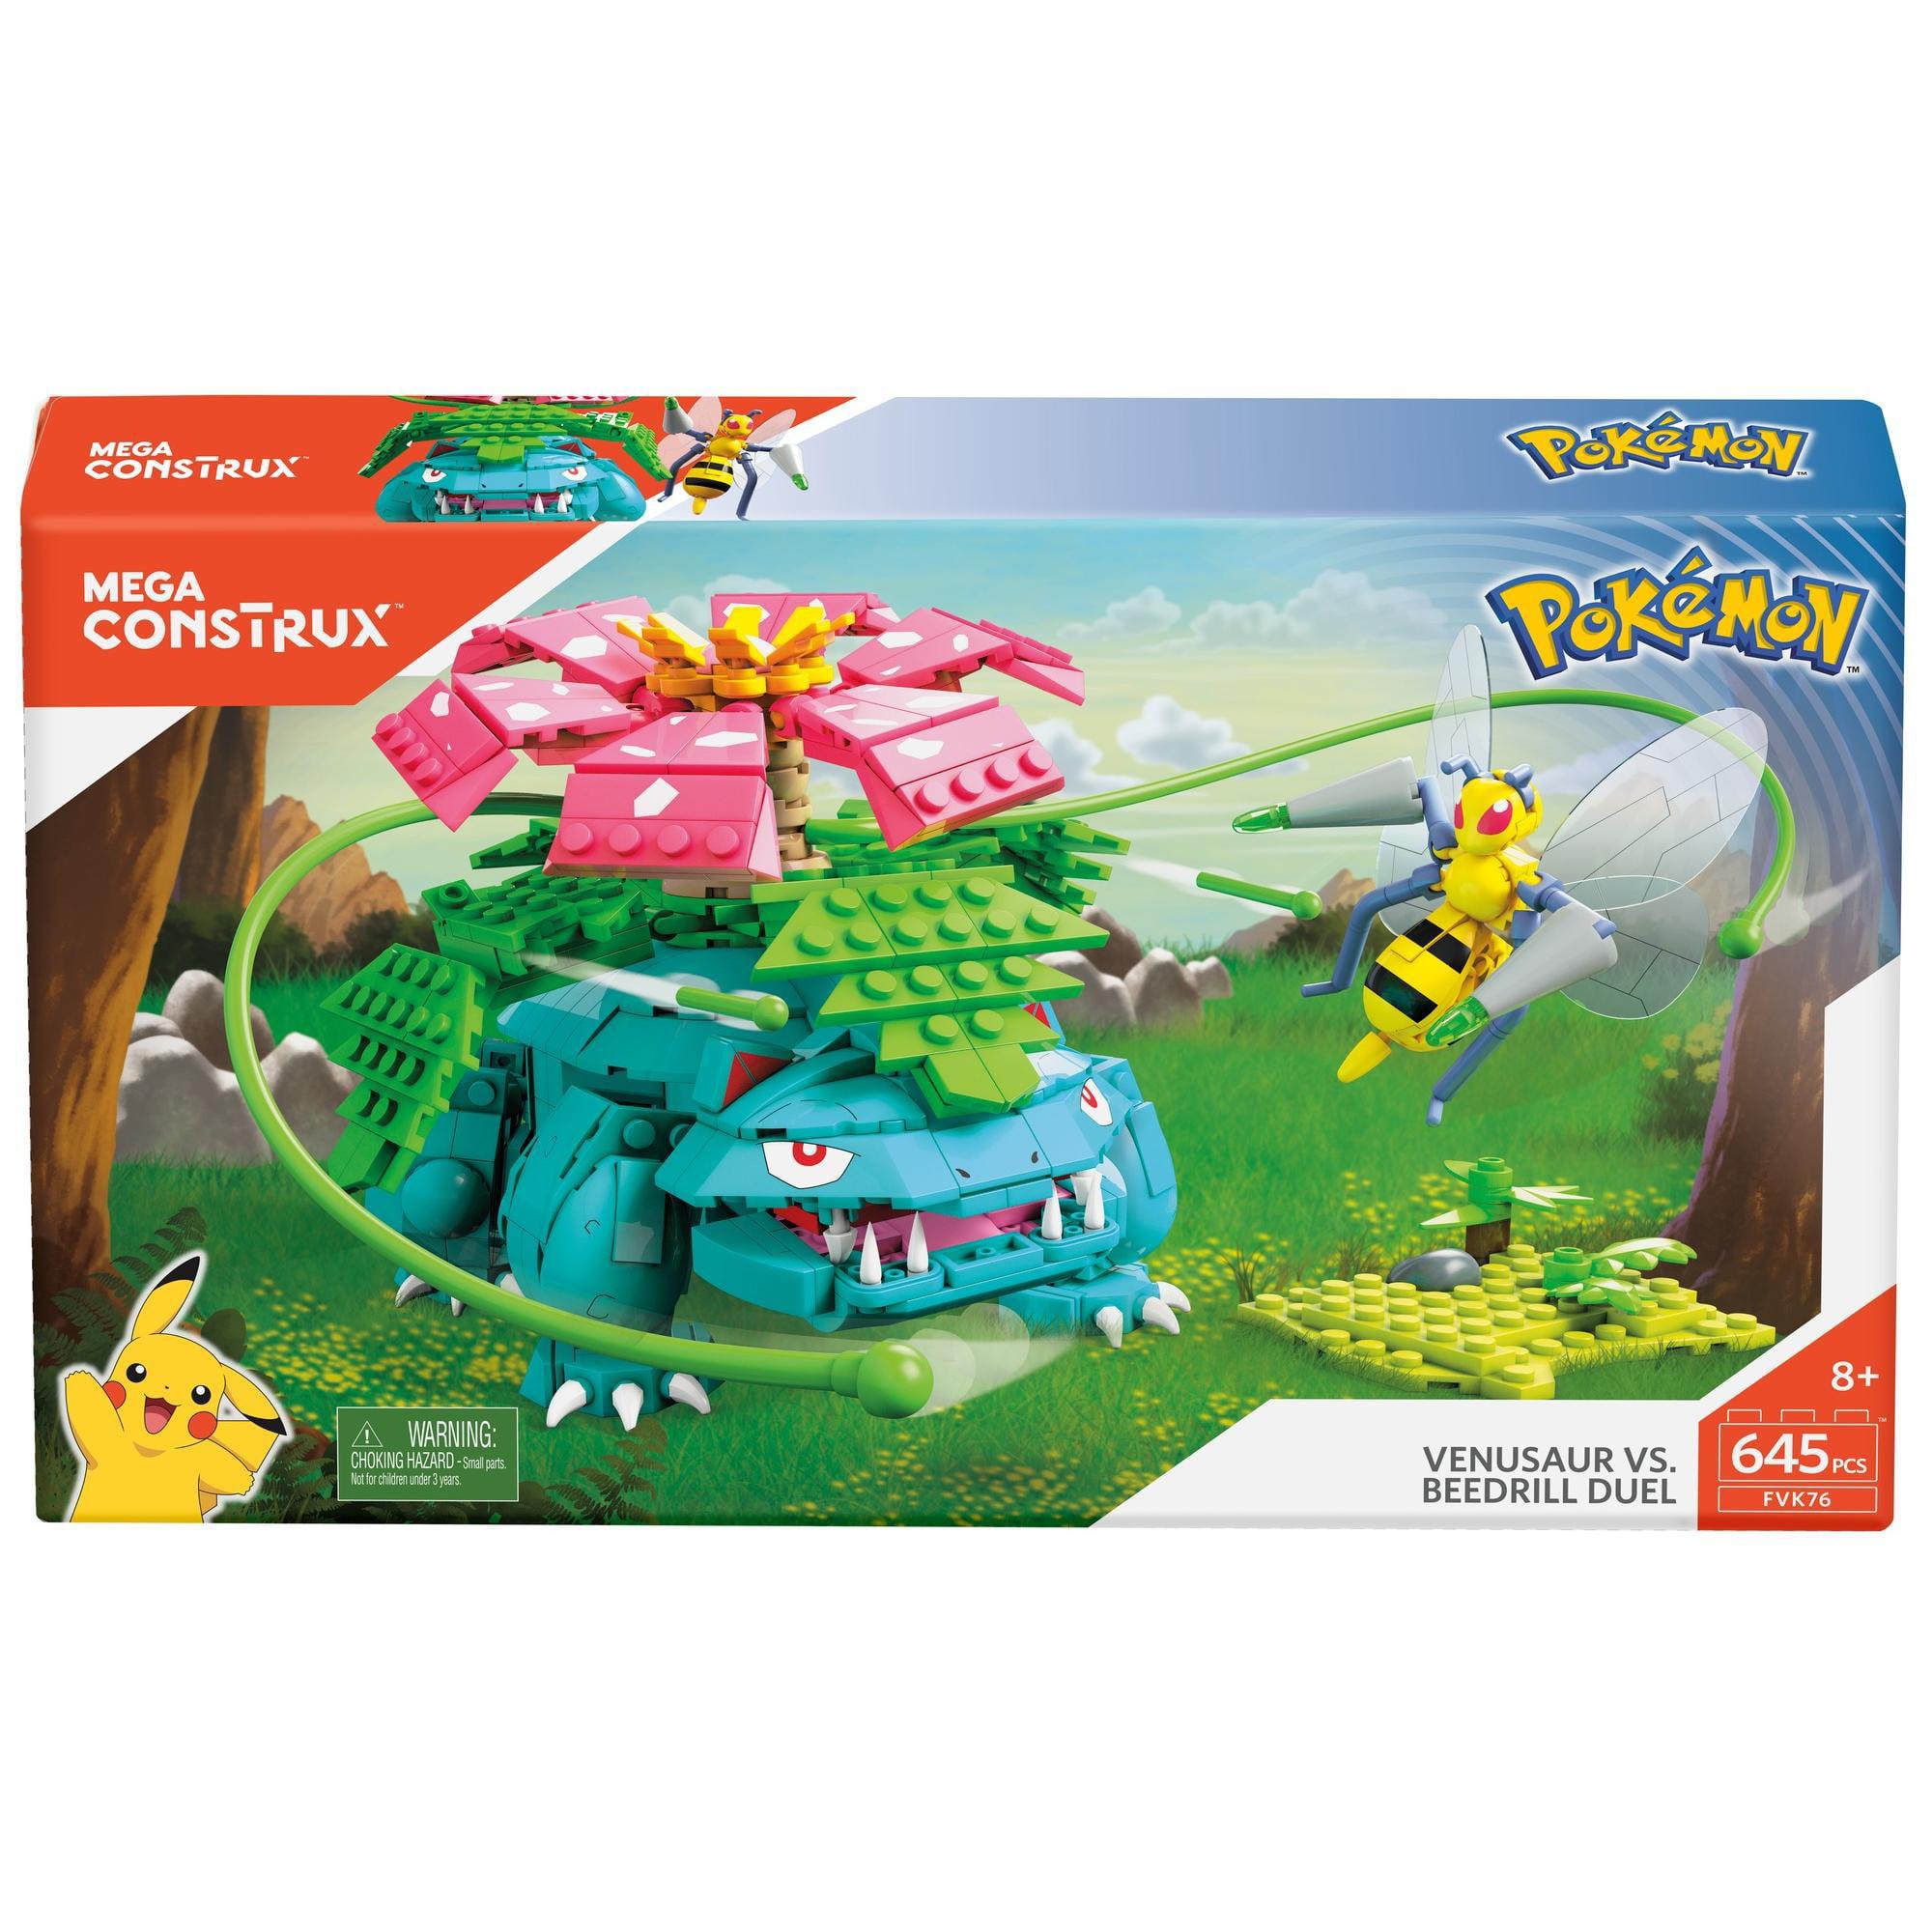 Mega Construx Pokemon Chikorita vs Snubbull.Lot of 2. Cyndaquil Totodile vs